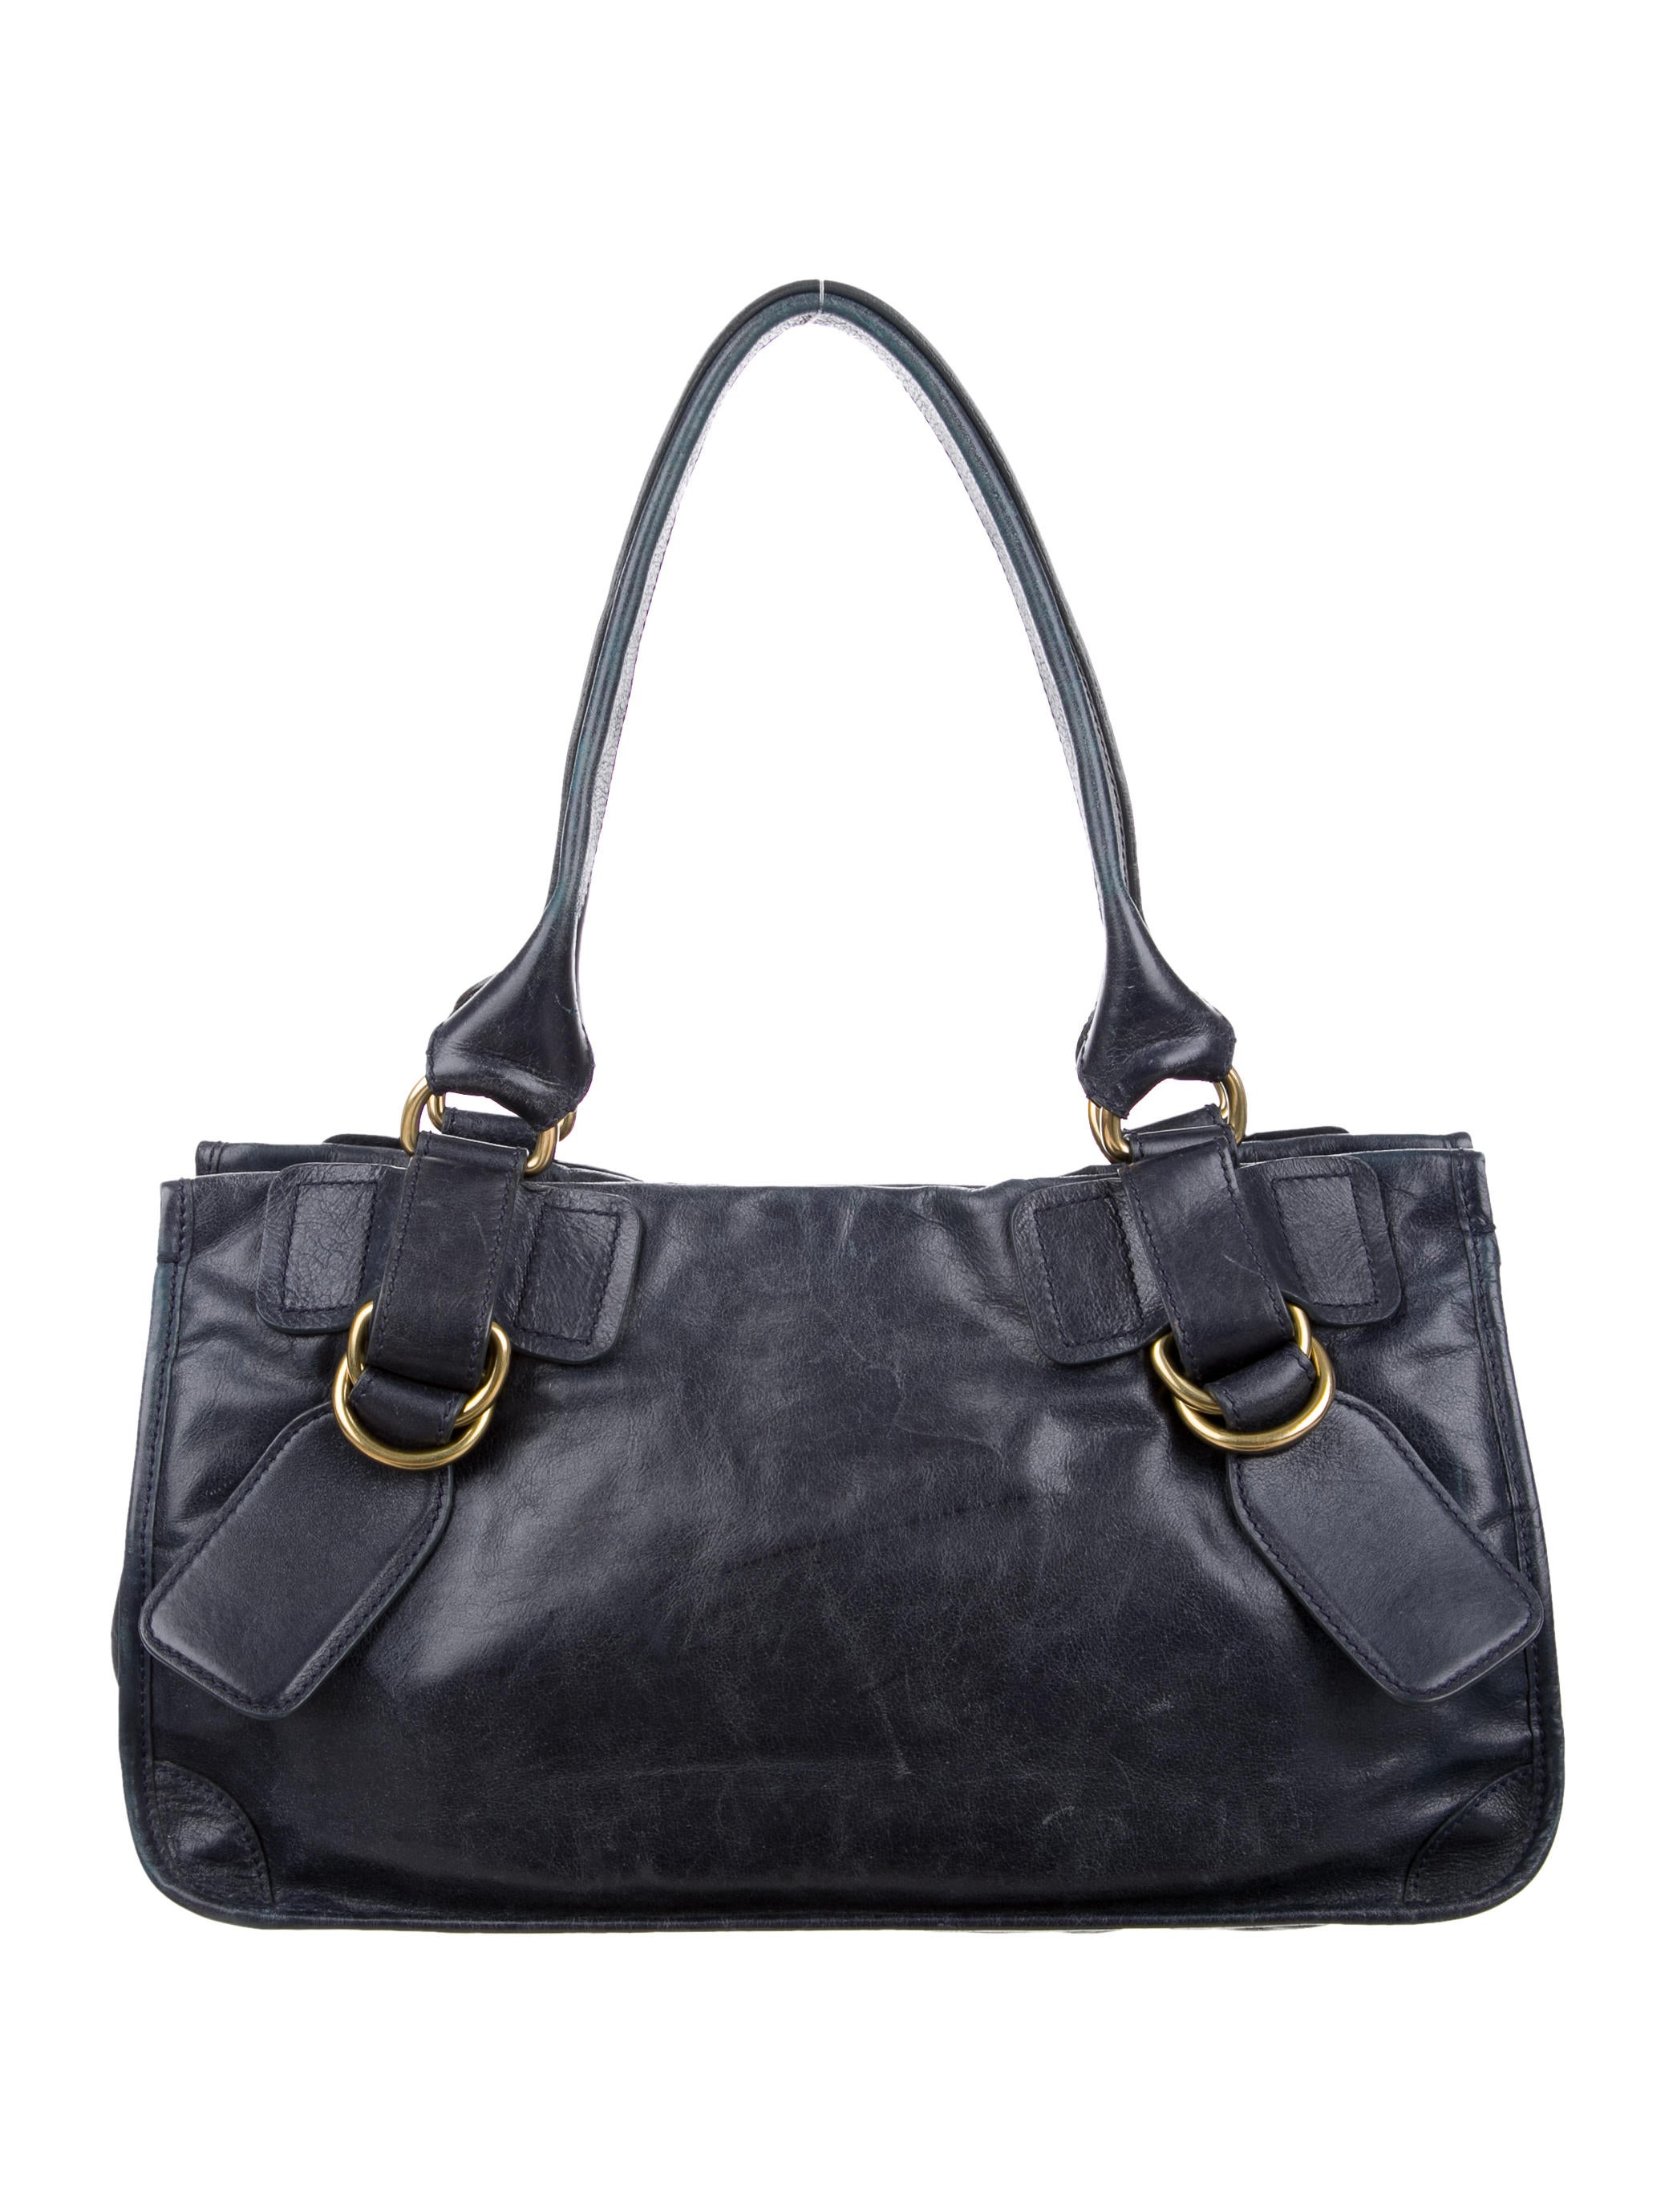 Celebrity Designer Inspired Replica Handbags | Save ...